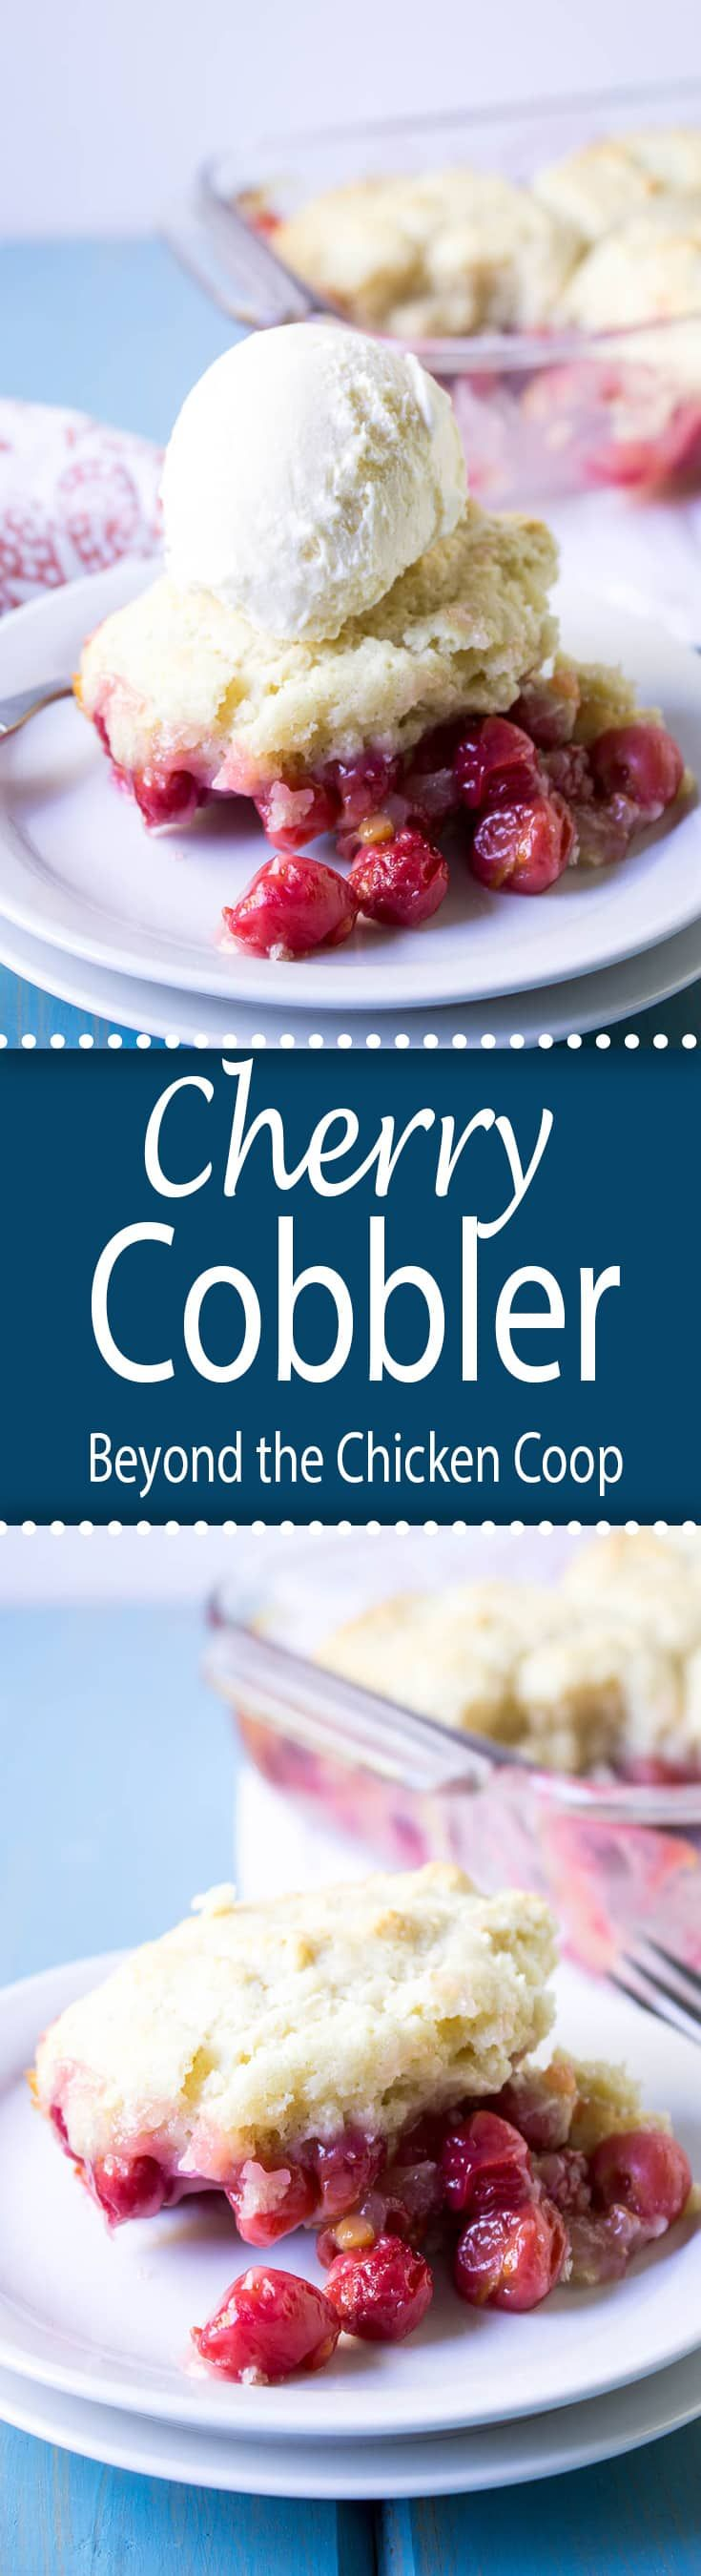 Cherry Cobbler with fresh sour pie cherries.